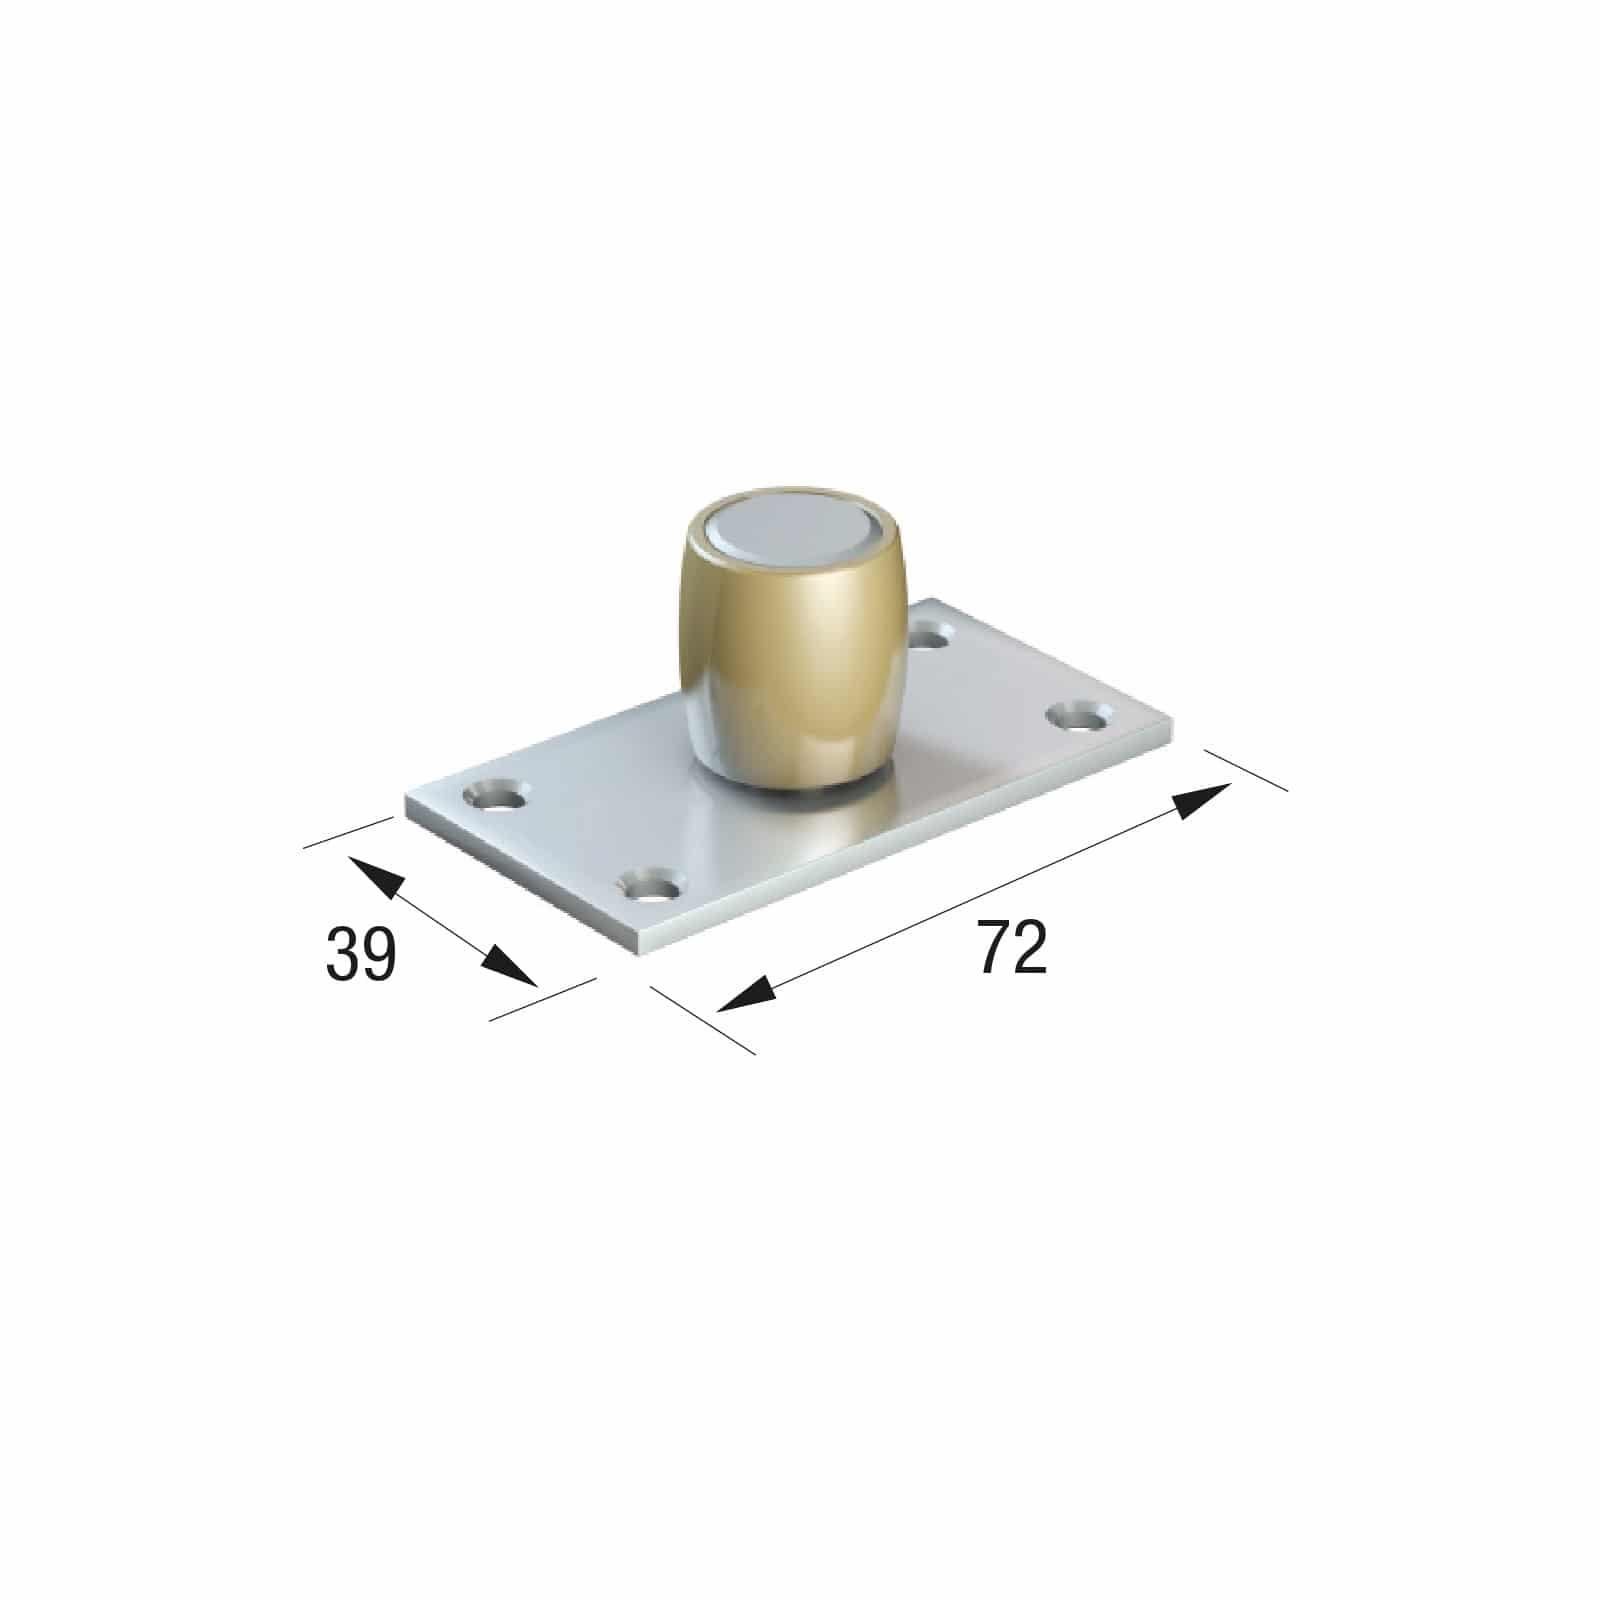 Series 50 20mm Diameter Brass Bottom Guide Roller, On Flat Steel Plate